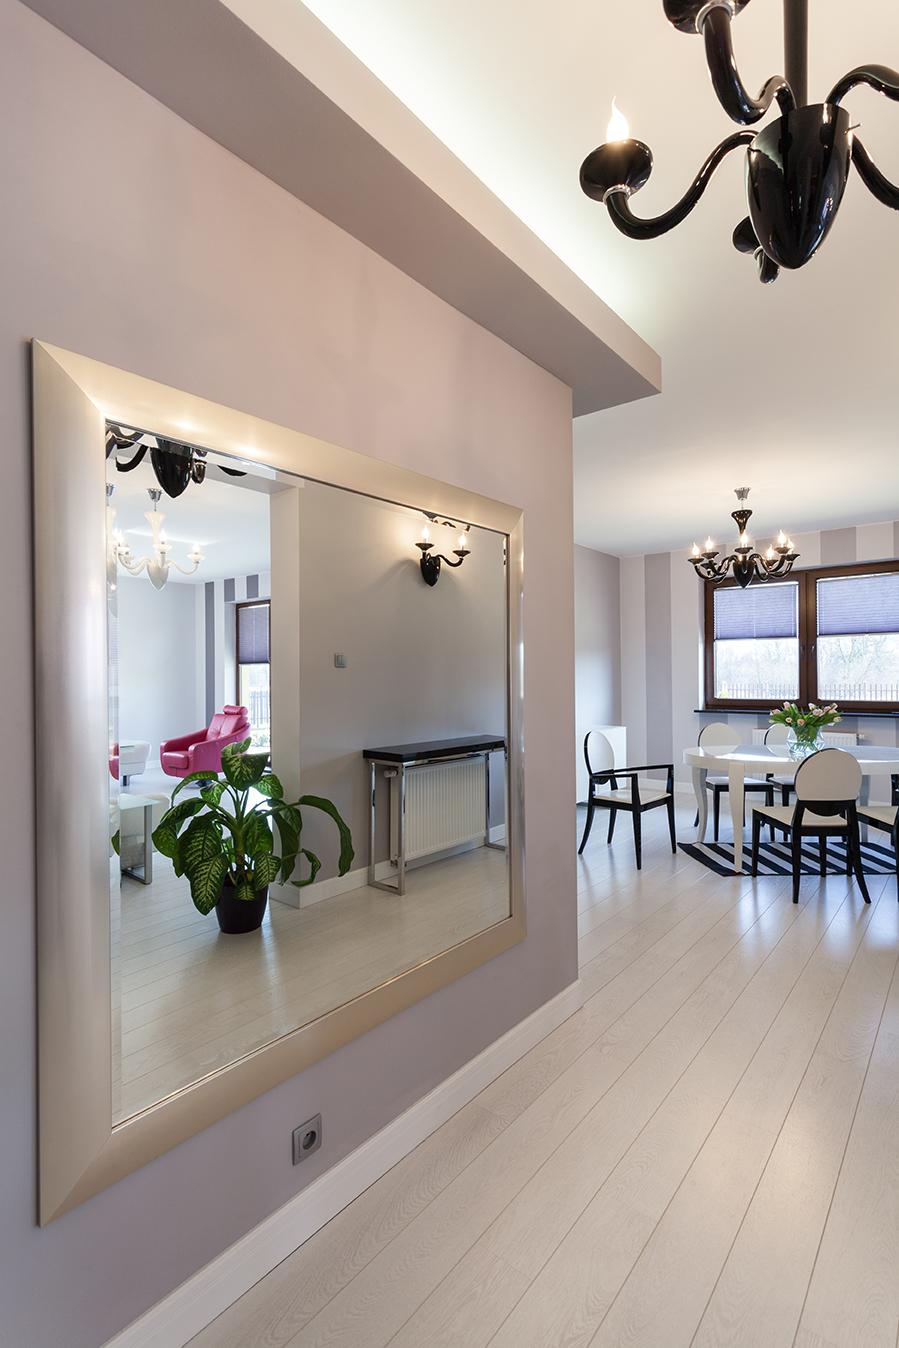 Rhonda's 9 Interior Design Tips For 2019